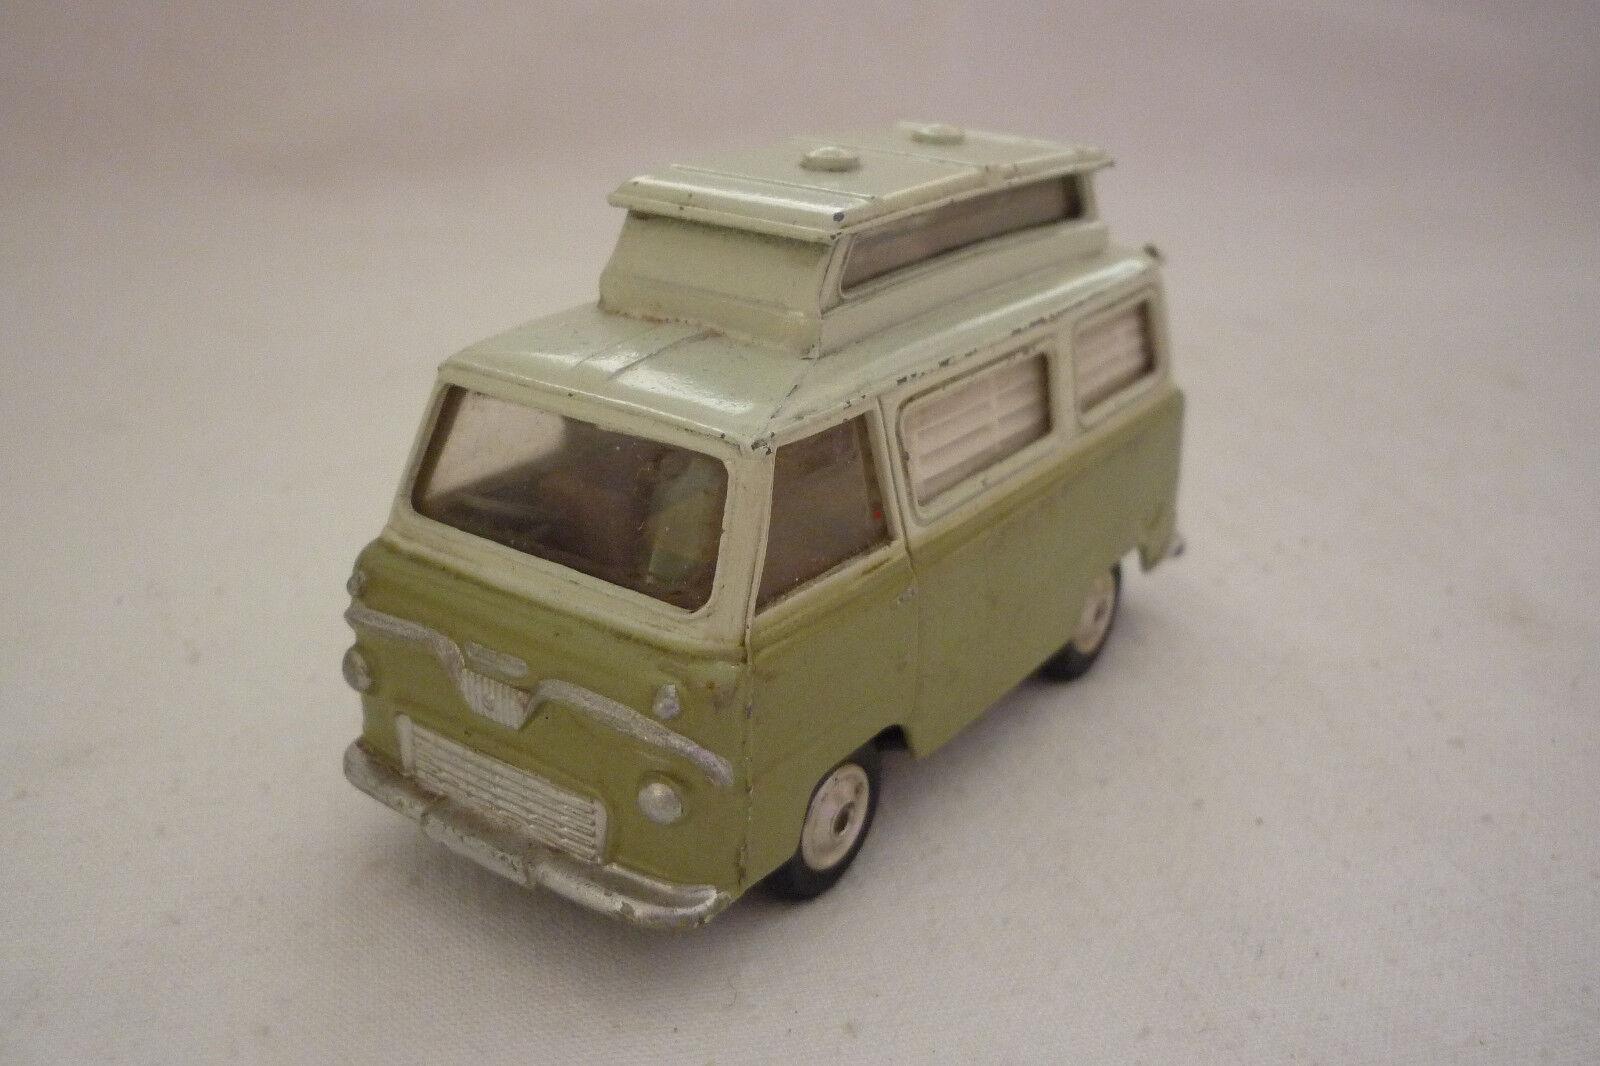 Corgi Toys-Vintage Metal Model - 420-Ford Thames-caravan - (corgi